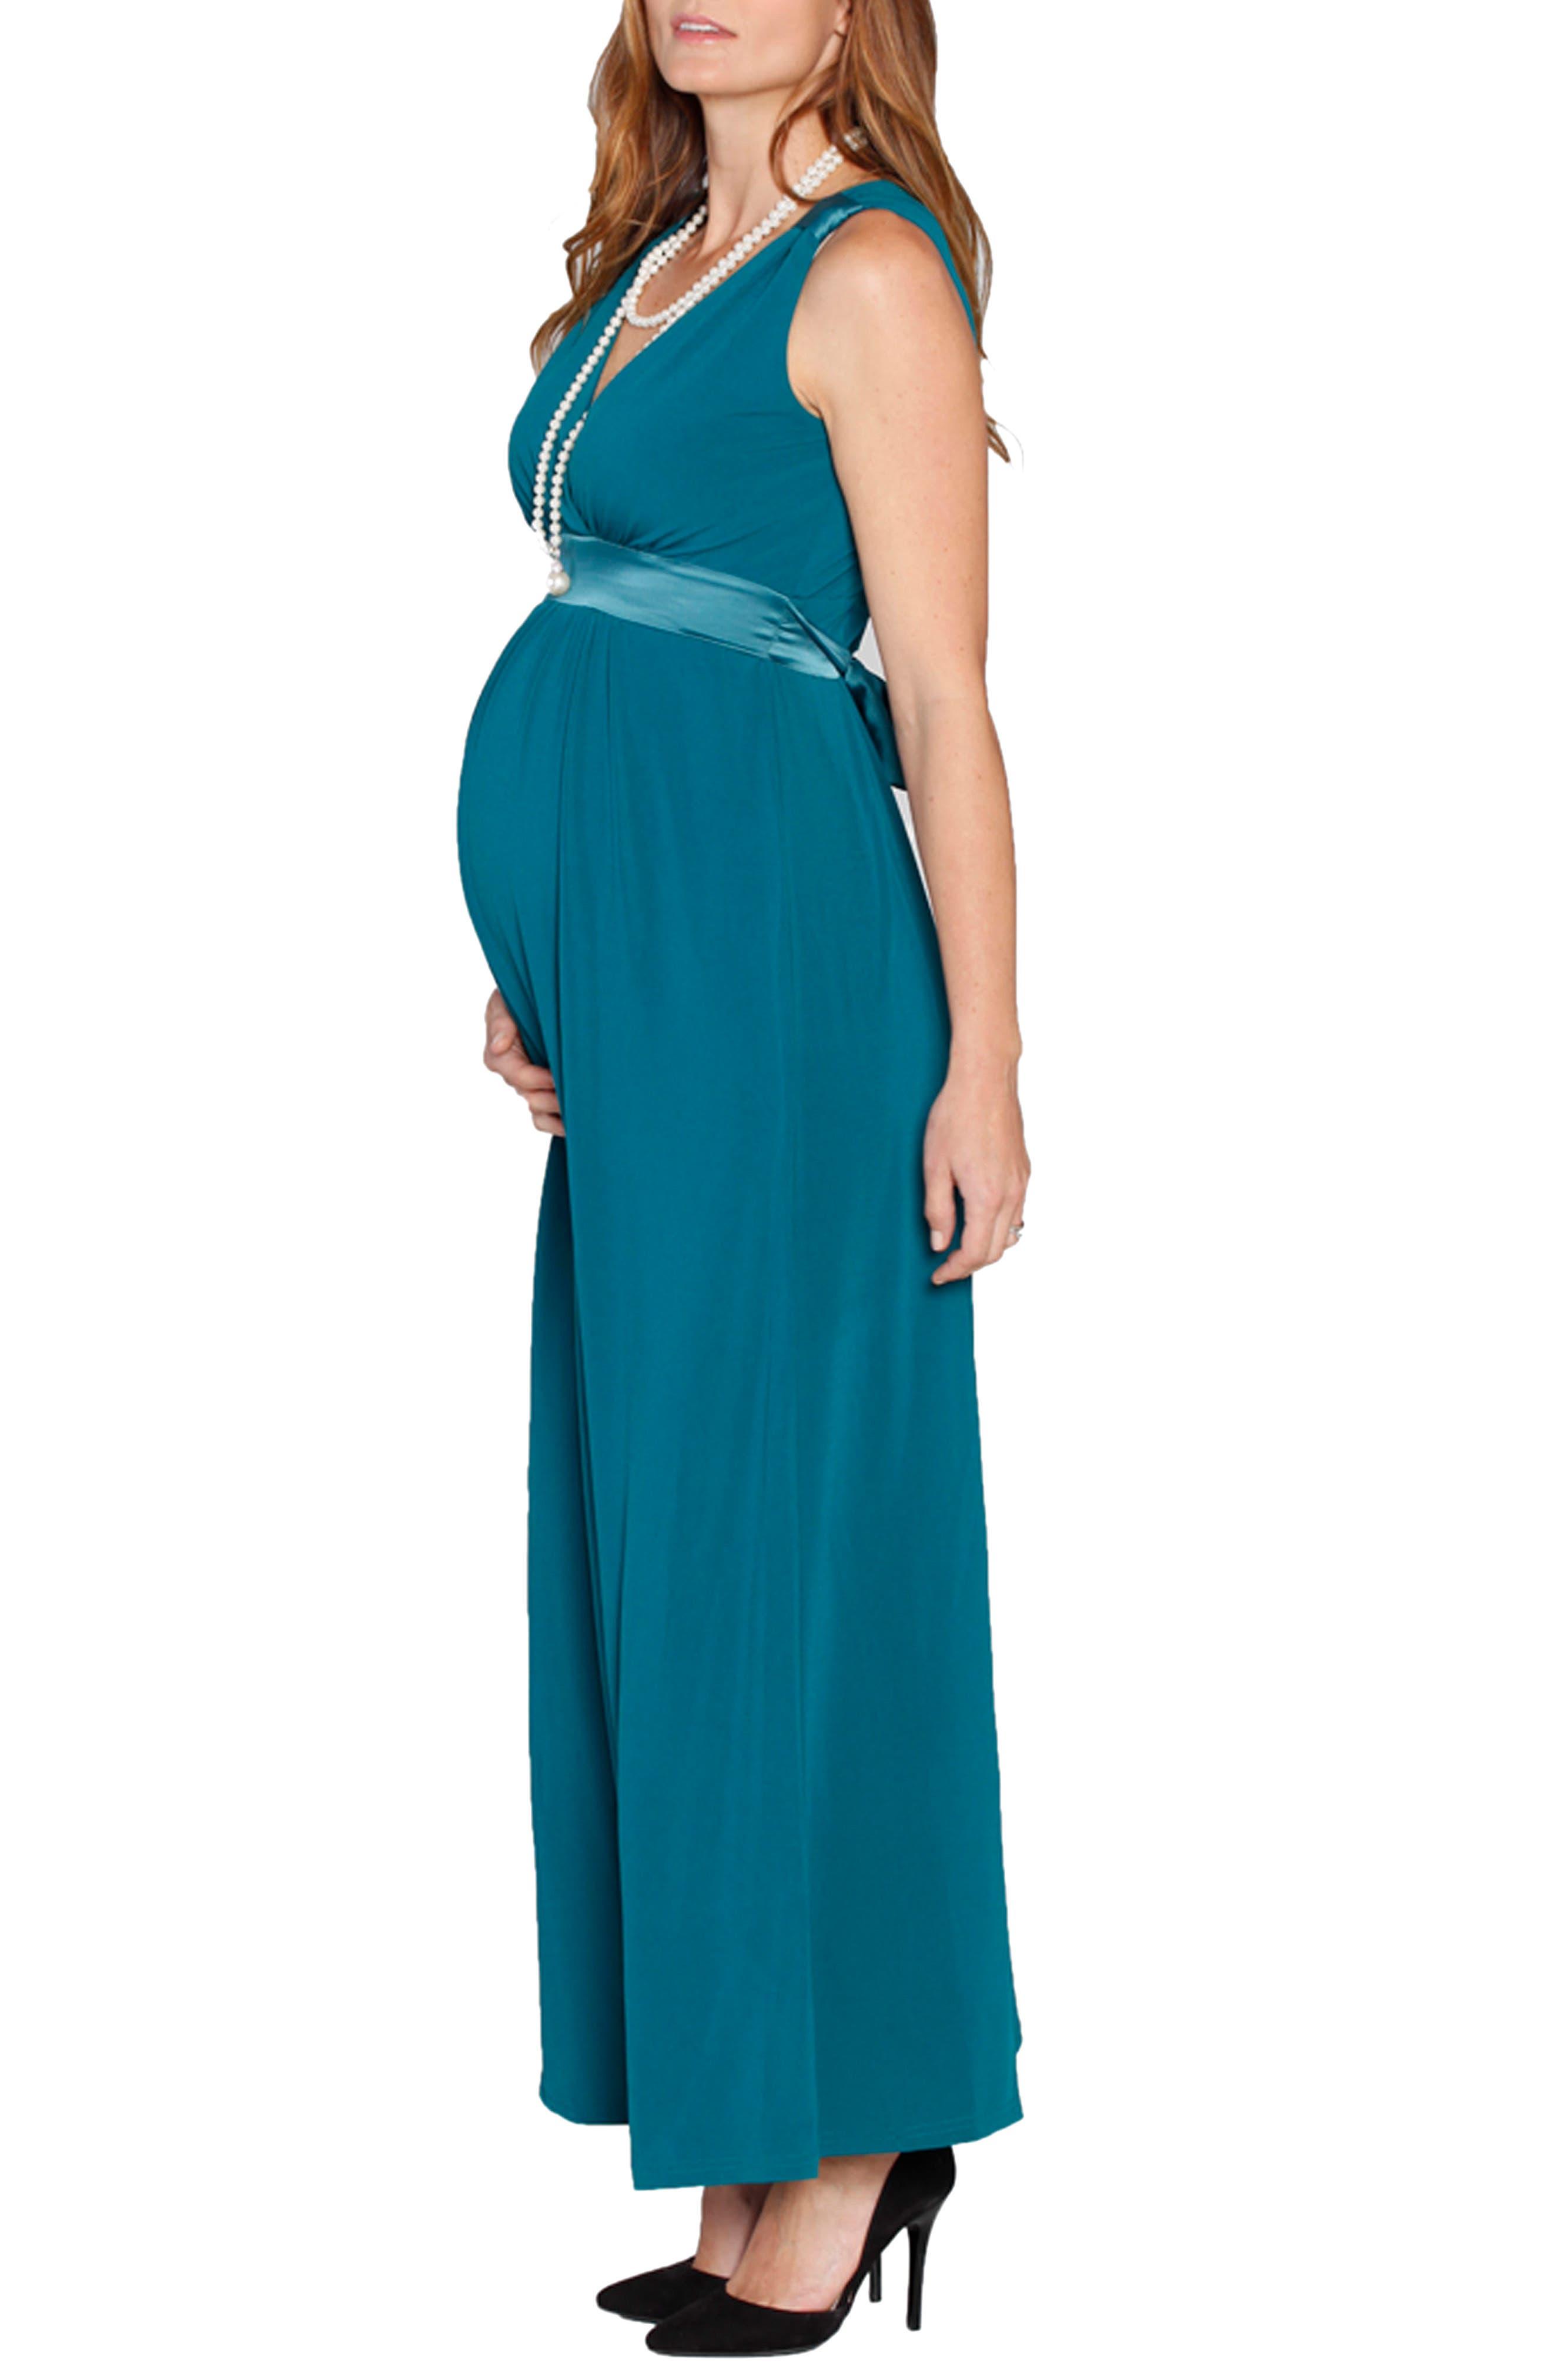 Angel Tie Waist Sleeveless Maternity/Nursing Gown & Bolero,                             Alternate thumbnail 3, color,                             440